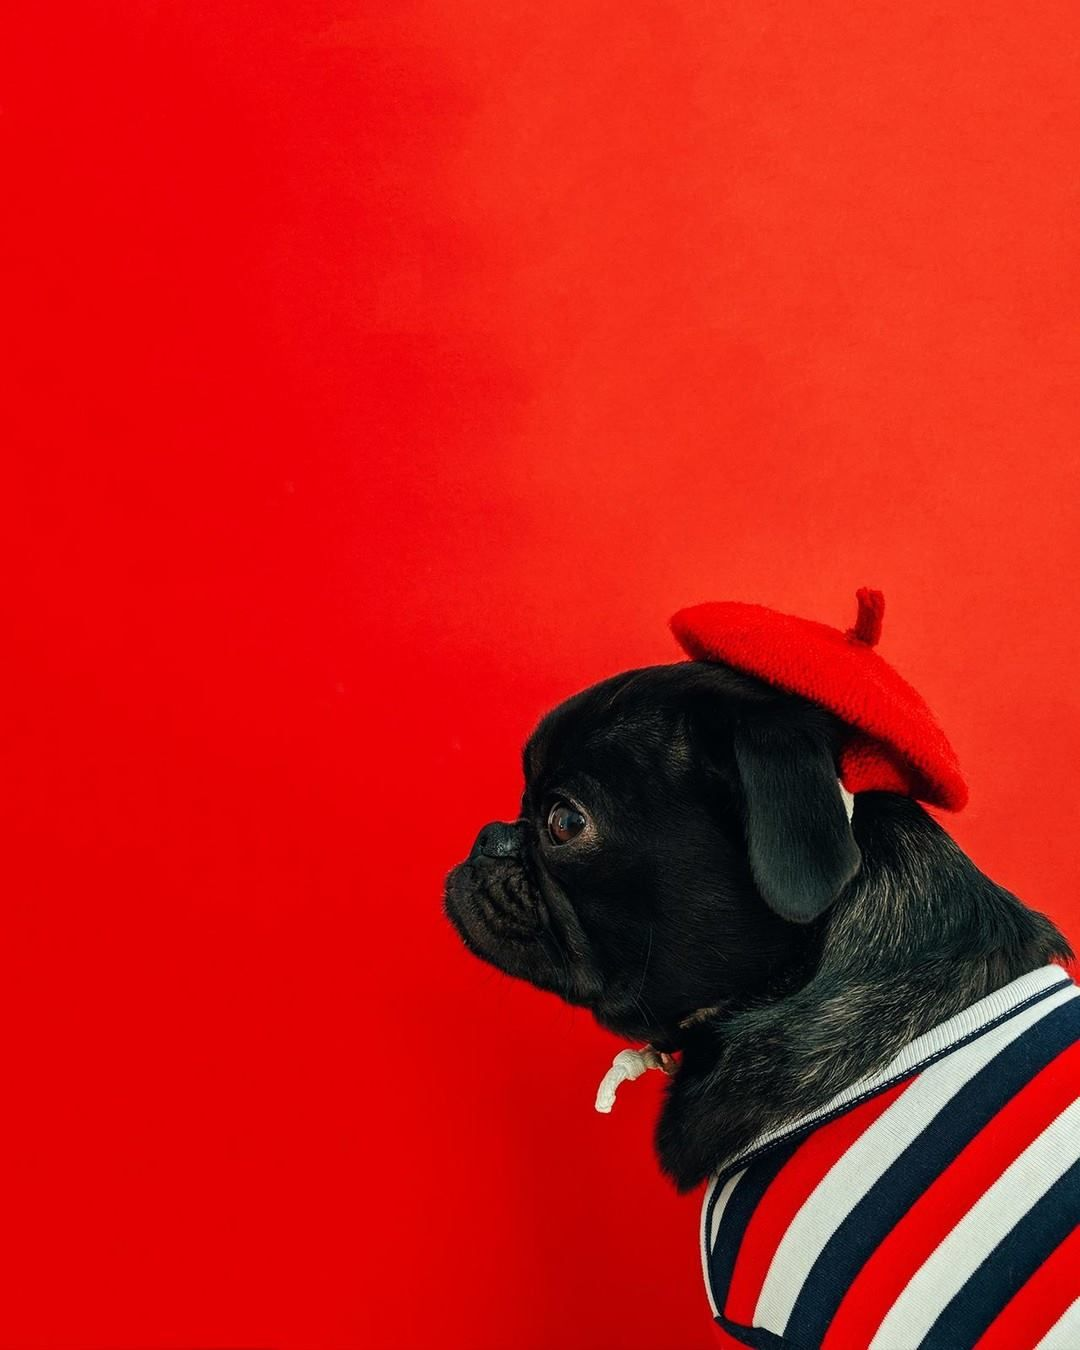 Pug In Red Hat Cute Pugs Black Pug Puppies